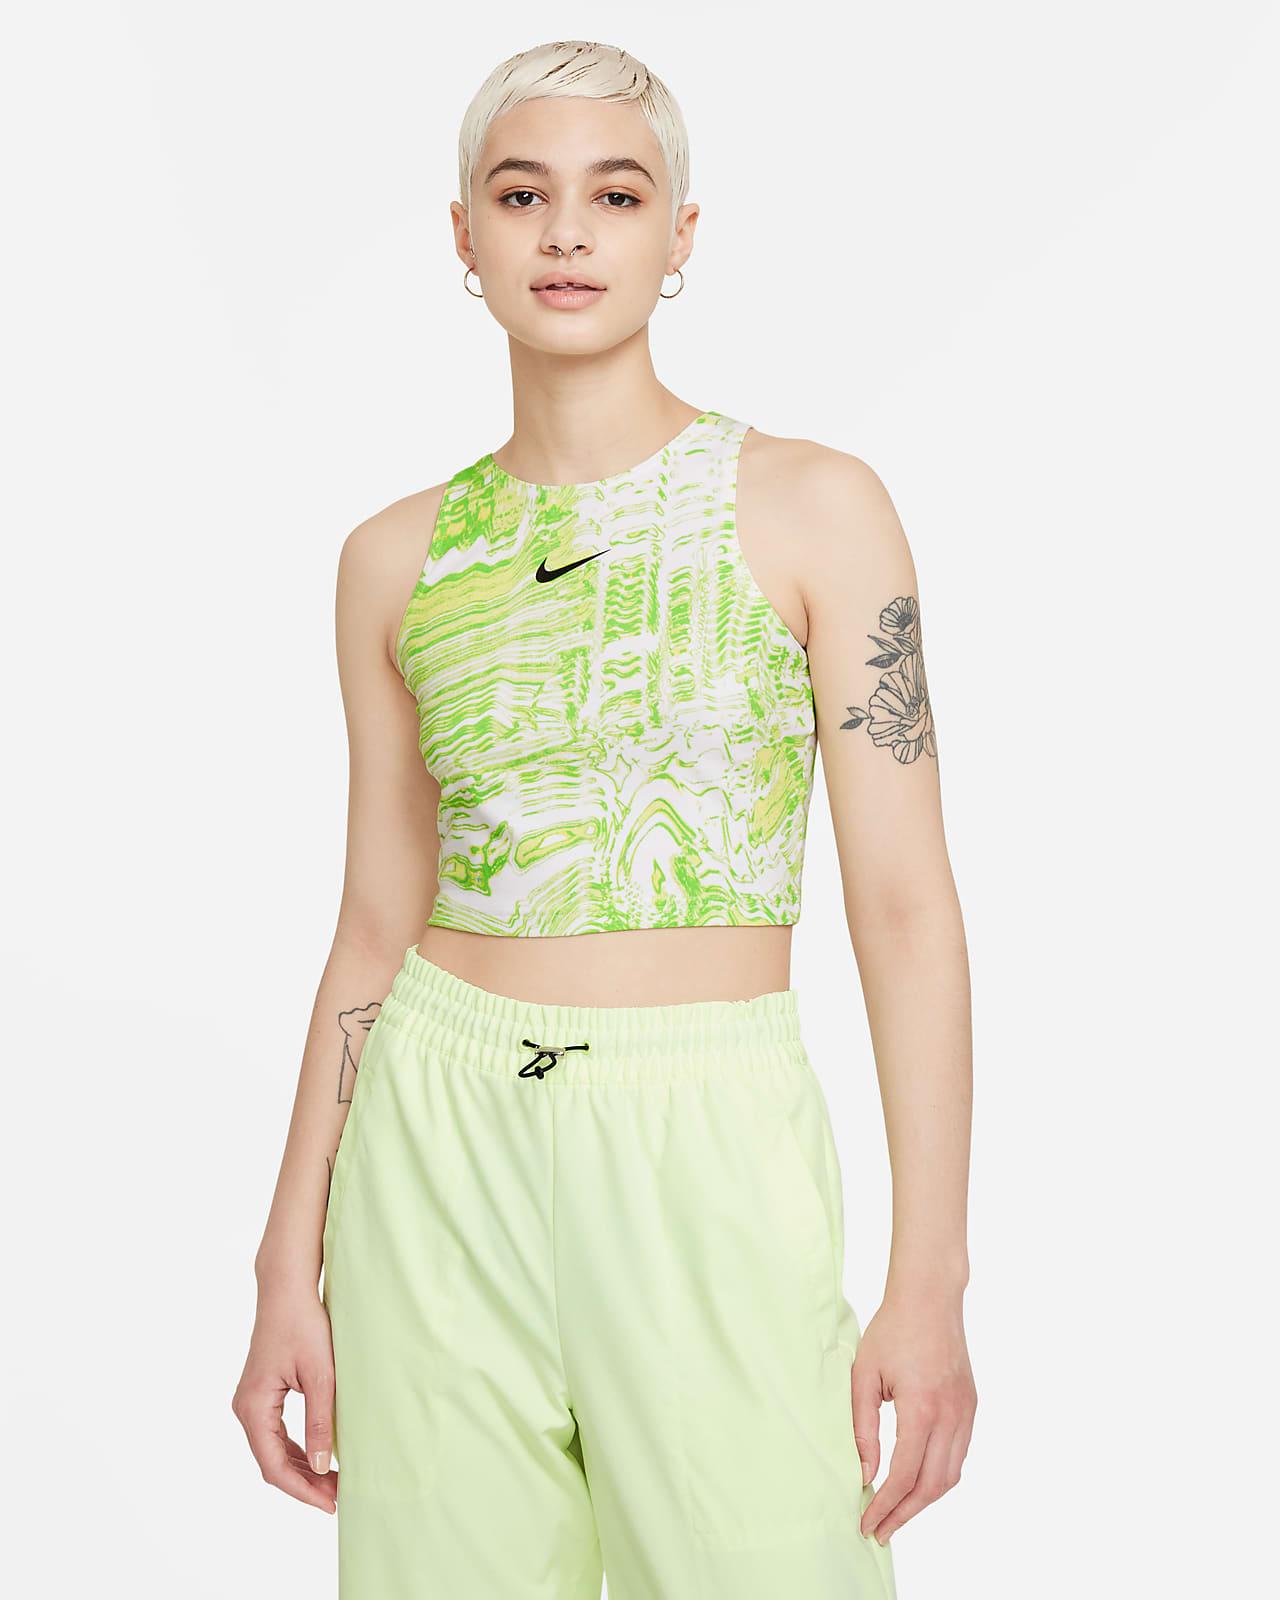 Danslinne Nike Sportswear för kvinnor